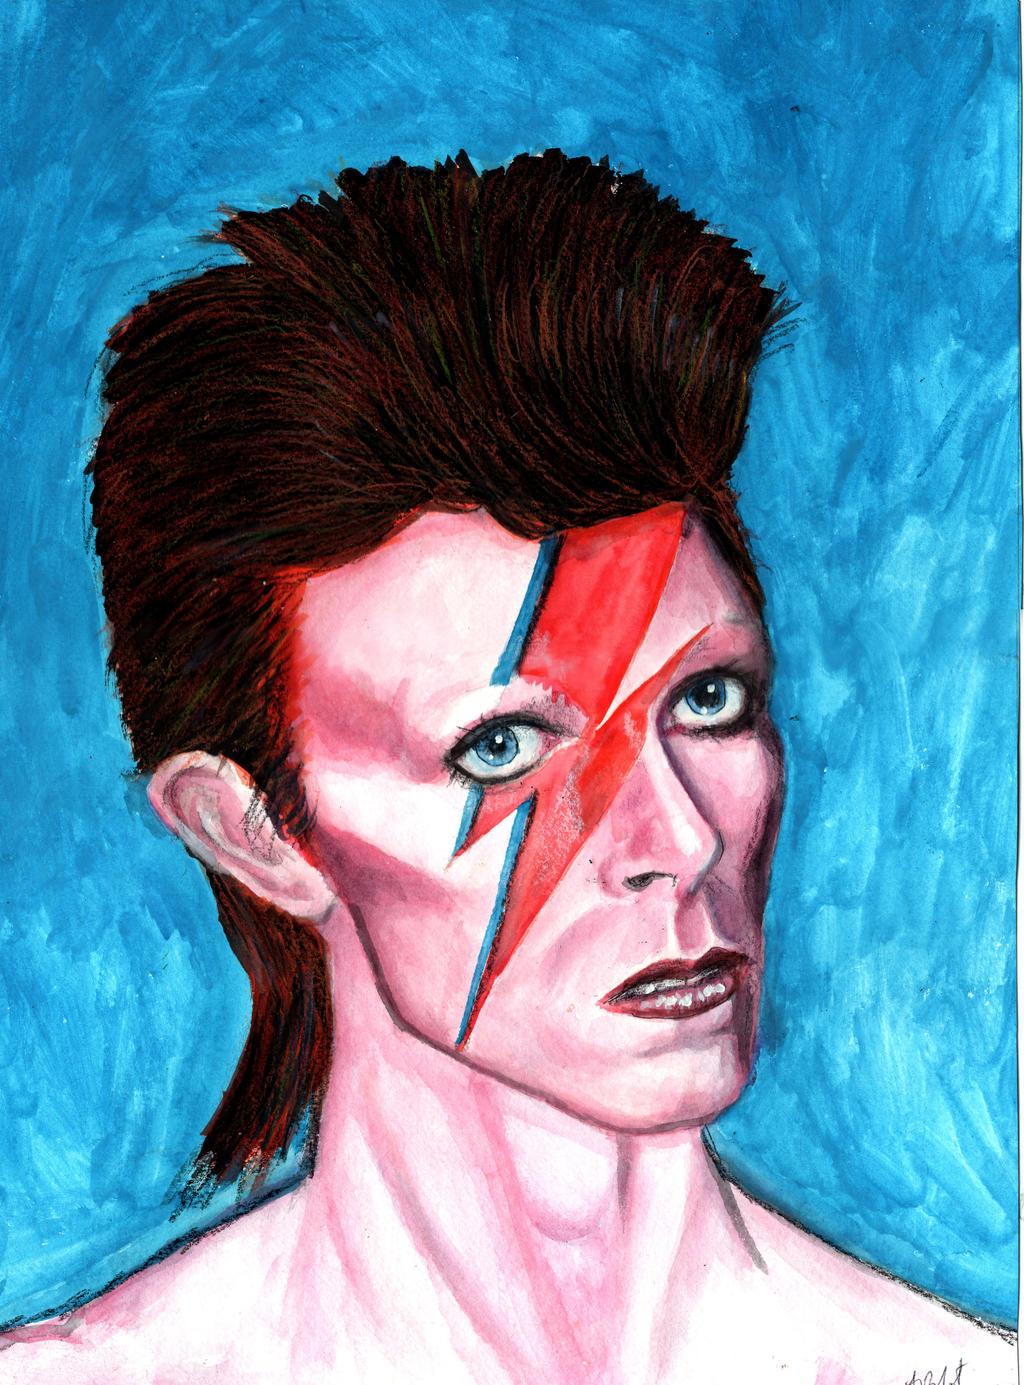 David Bowie by amybalot